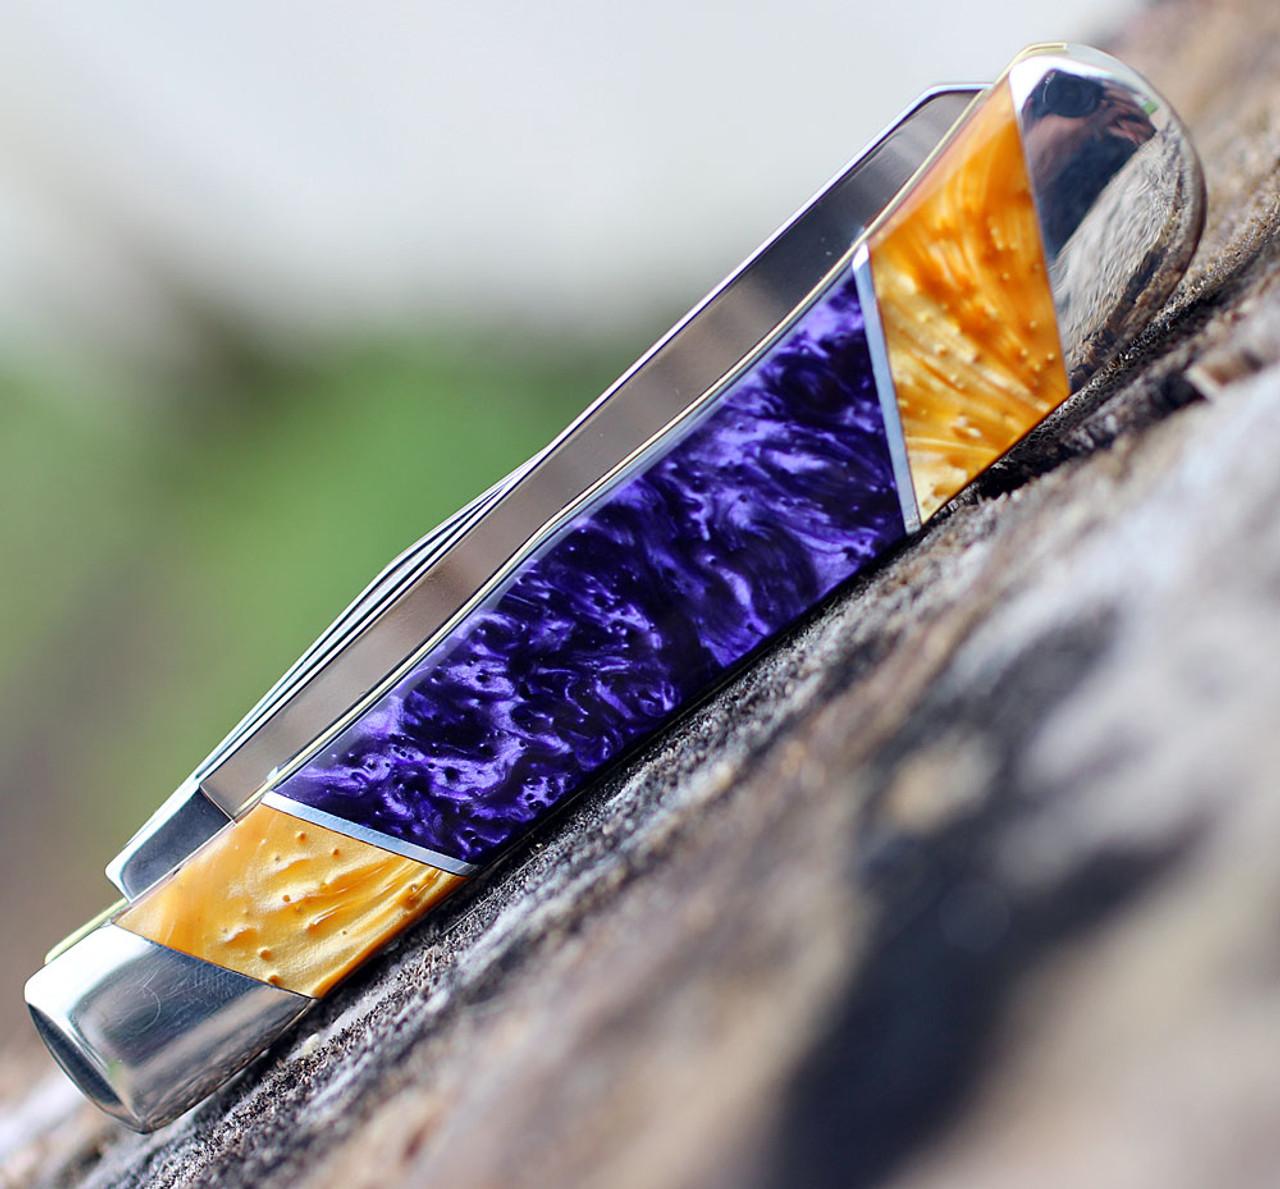 Case LSU19-CATPG Trapper Gift Set, LSU Purple & Gold Corelon Handle (9254 SS)